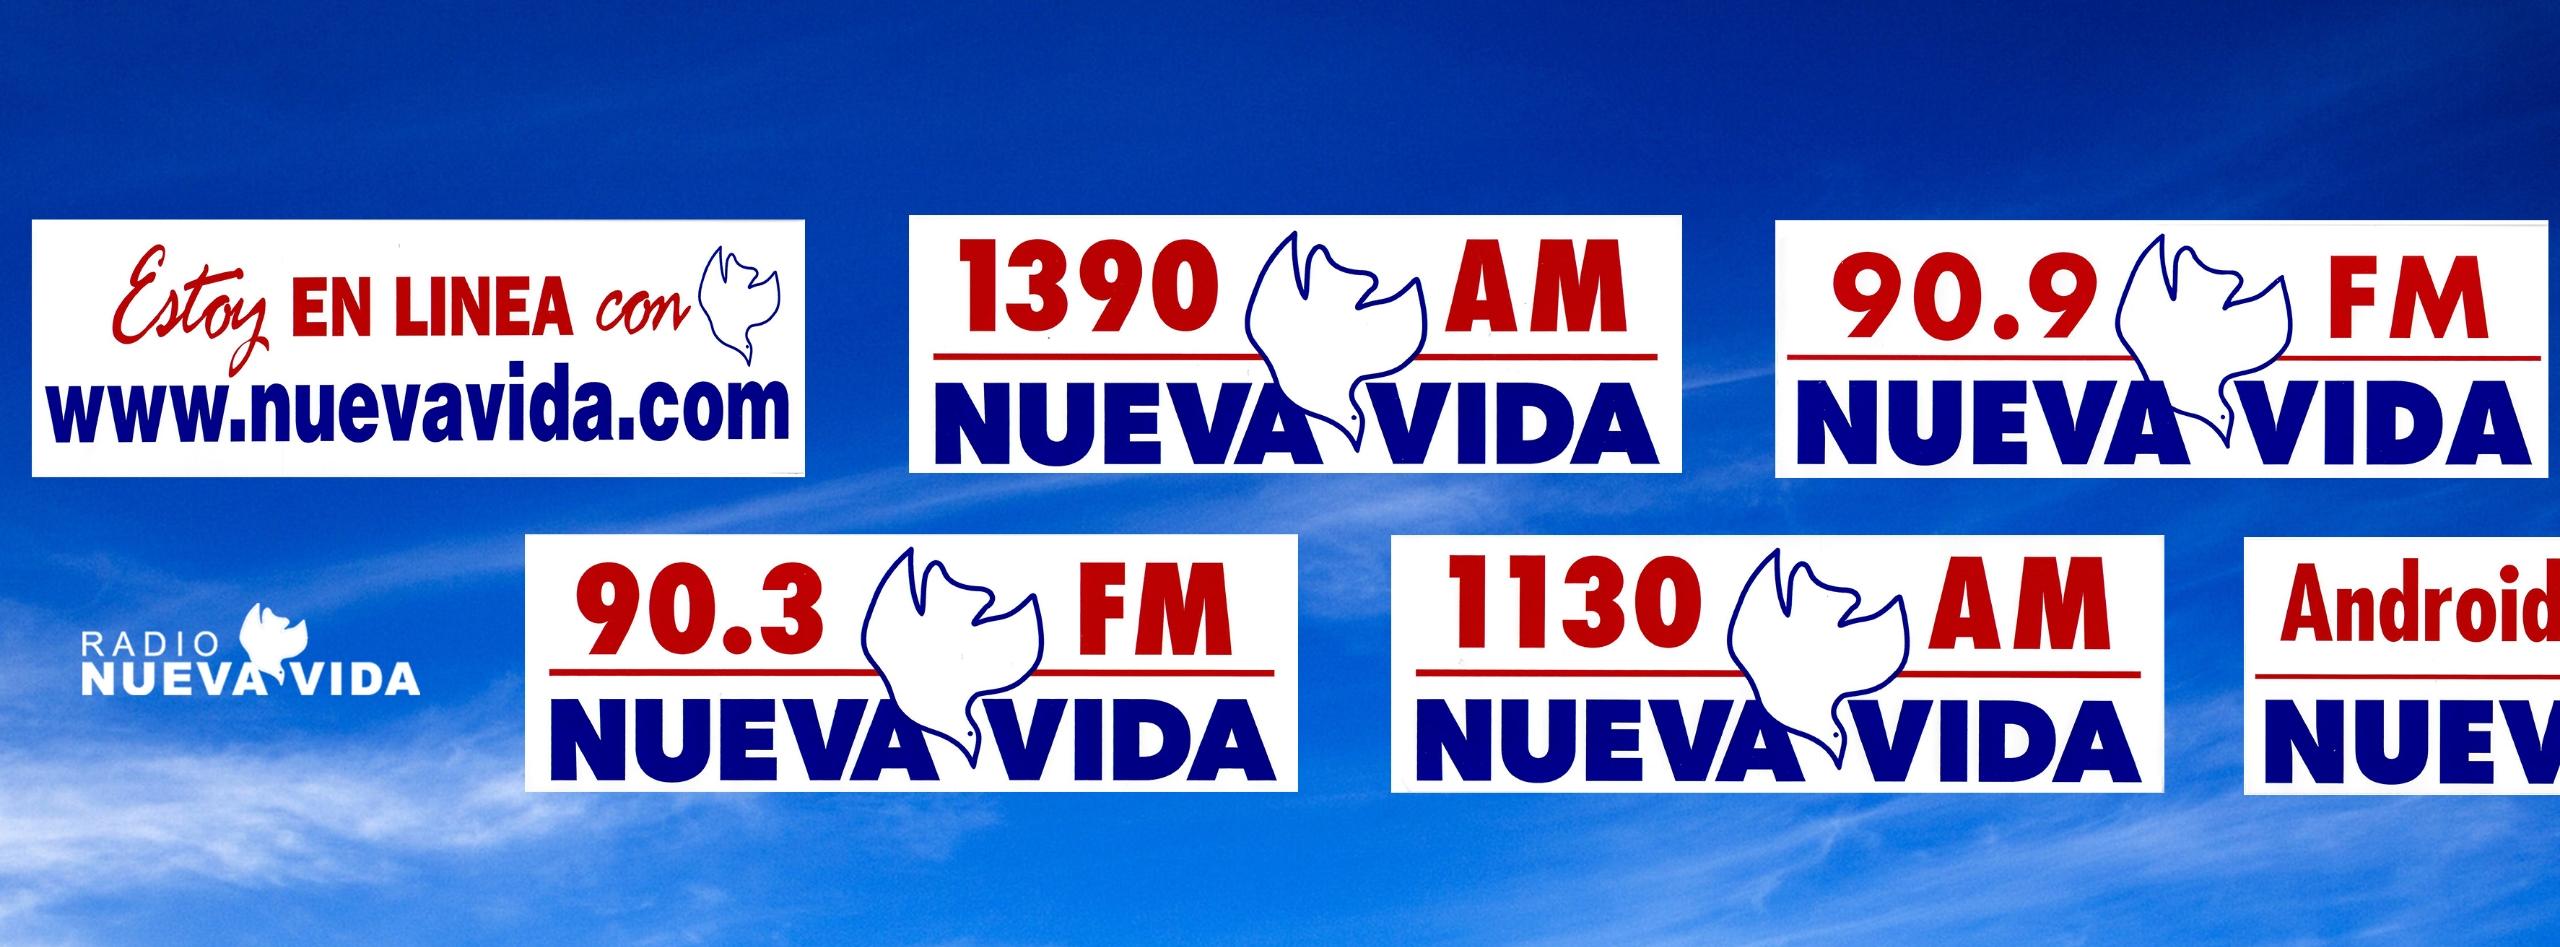 Radio Nueva Vida (@radionuevavida) Cover Image